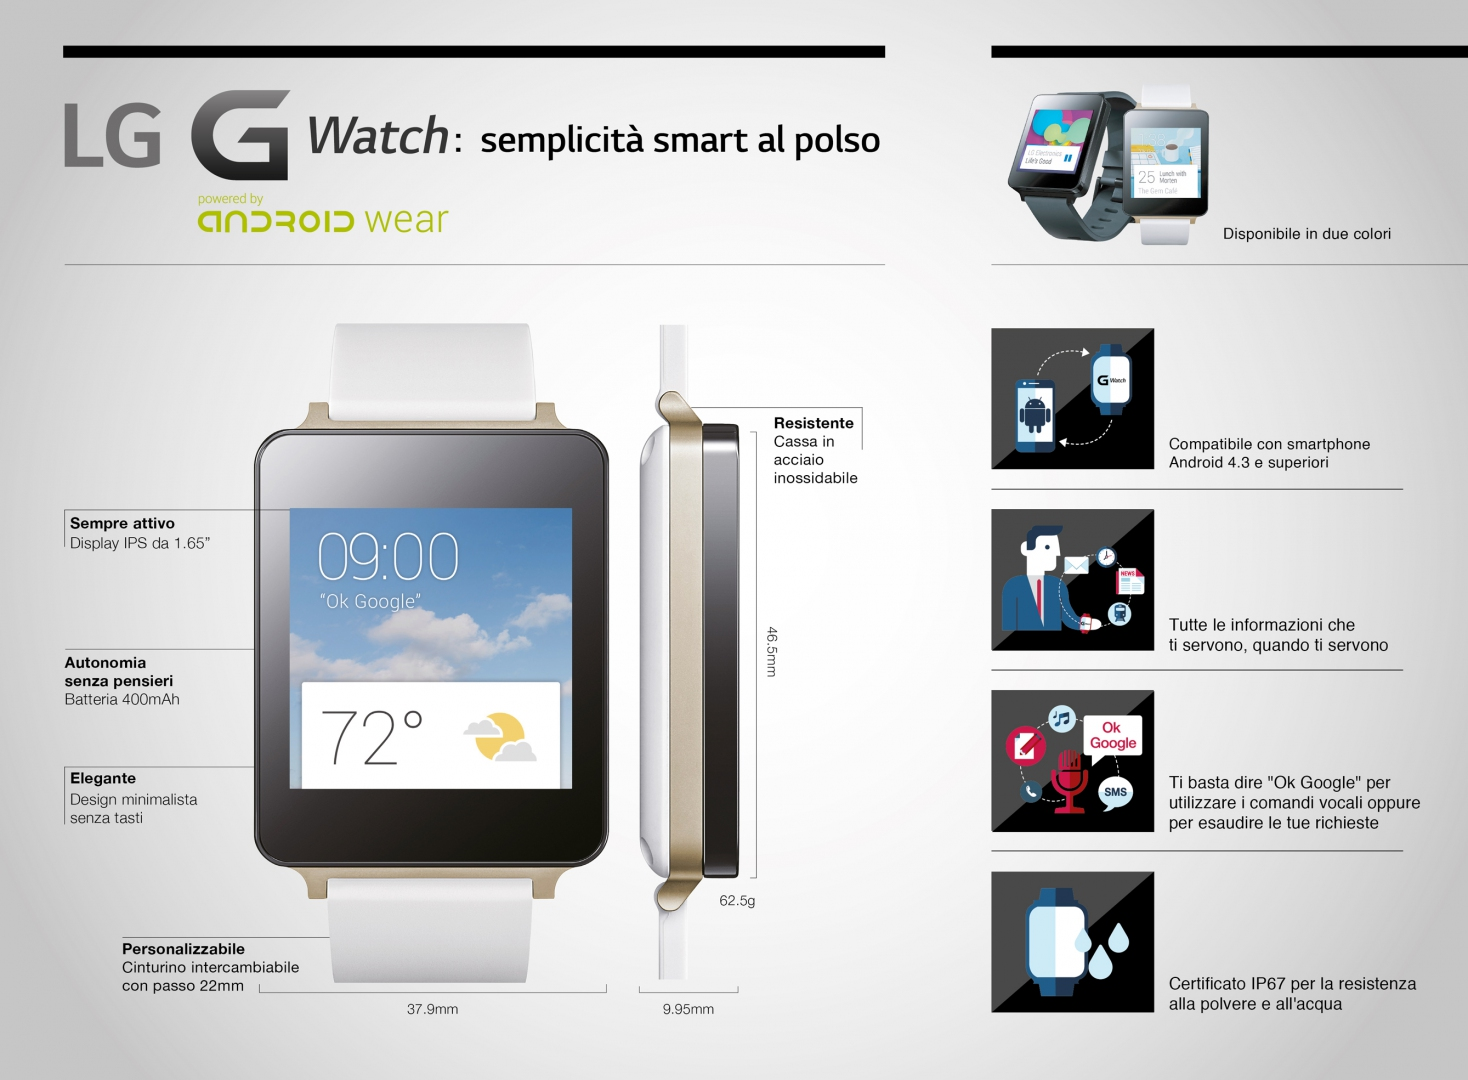 LG-G watch-avrmagazine